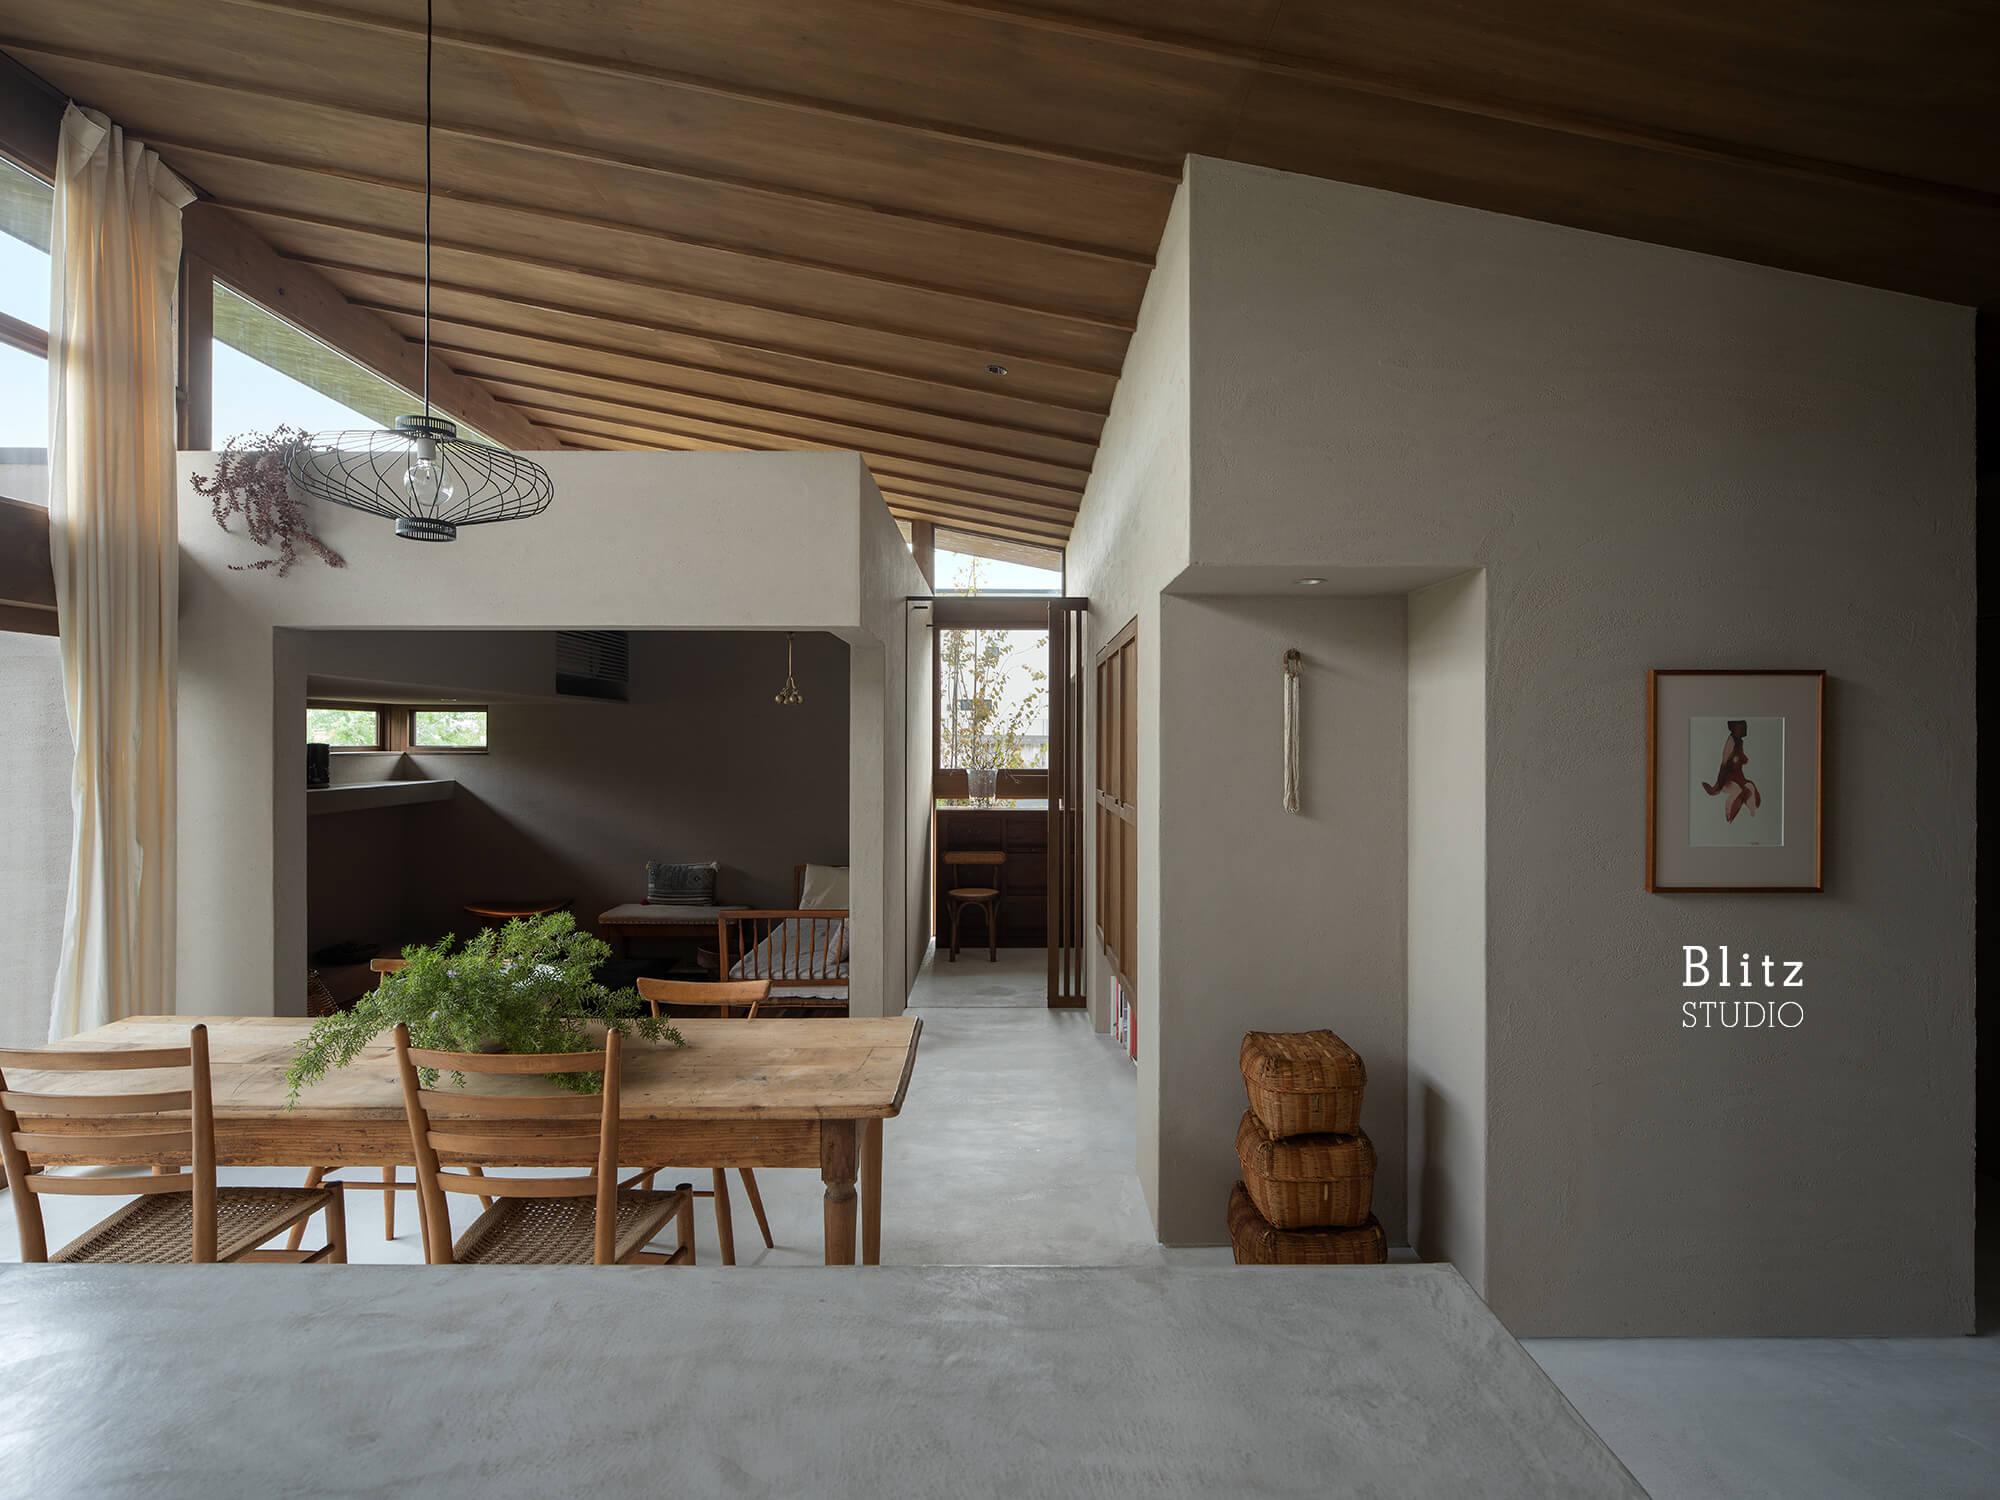 『姶良の家』-鹿児島県姶良市-建築写真・竣工写真・インテリア写真3